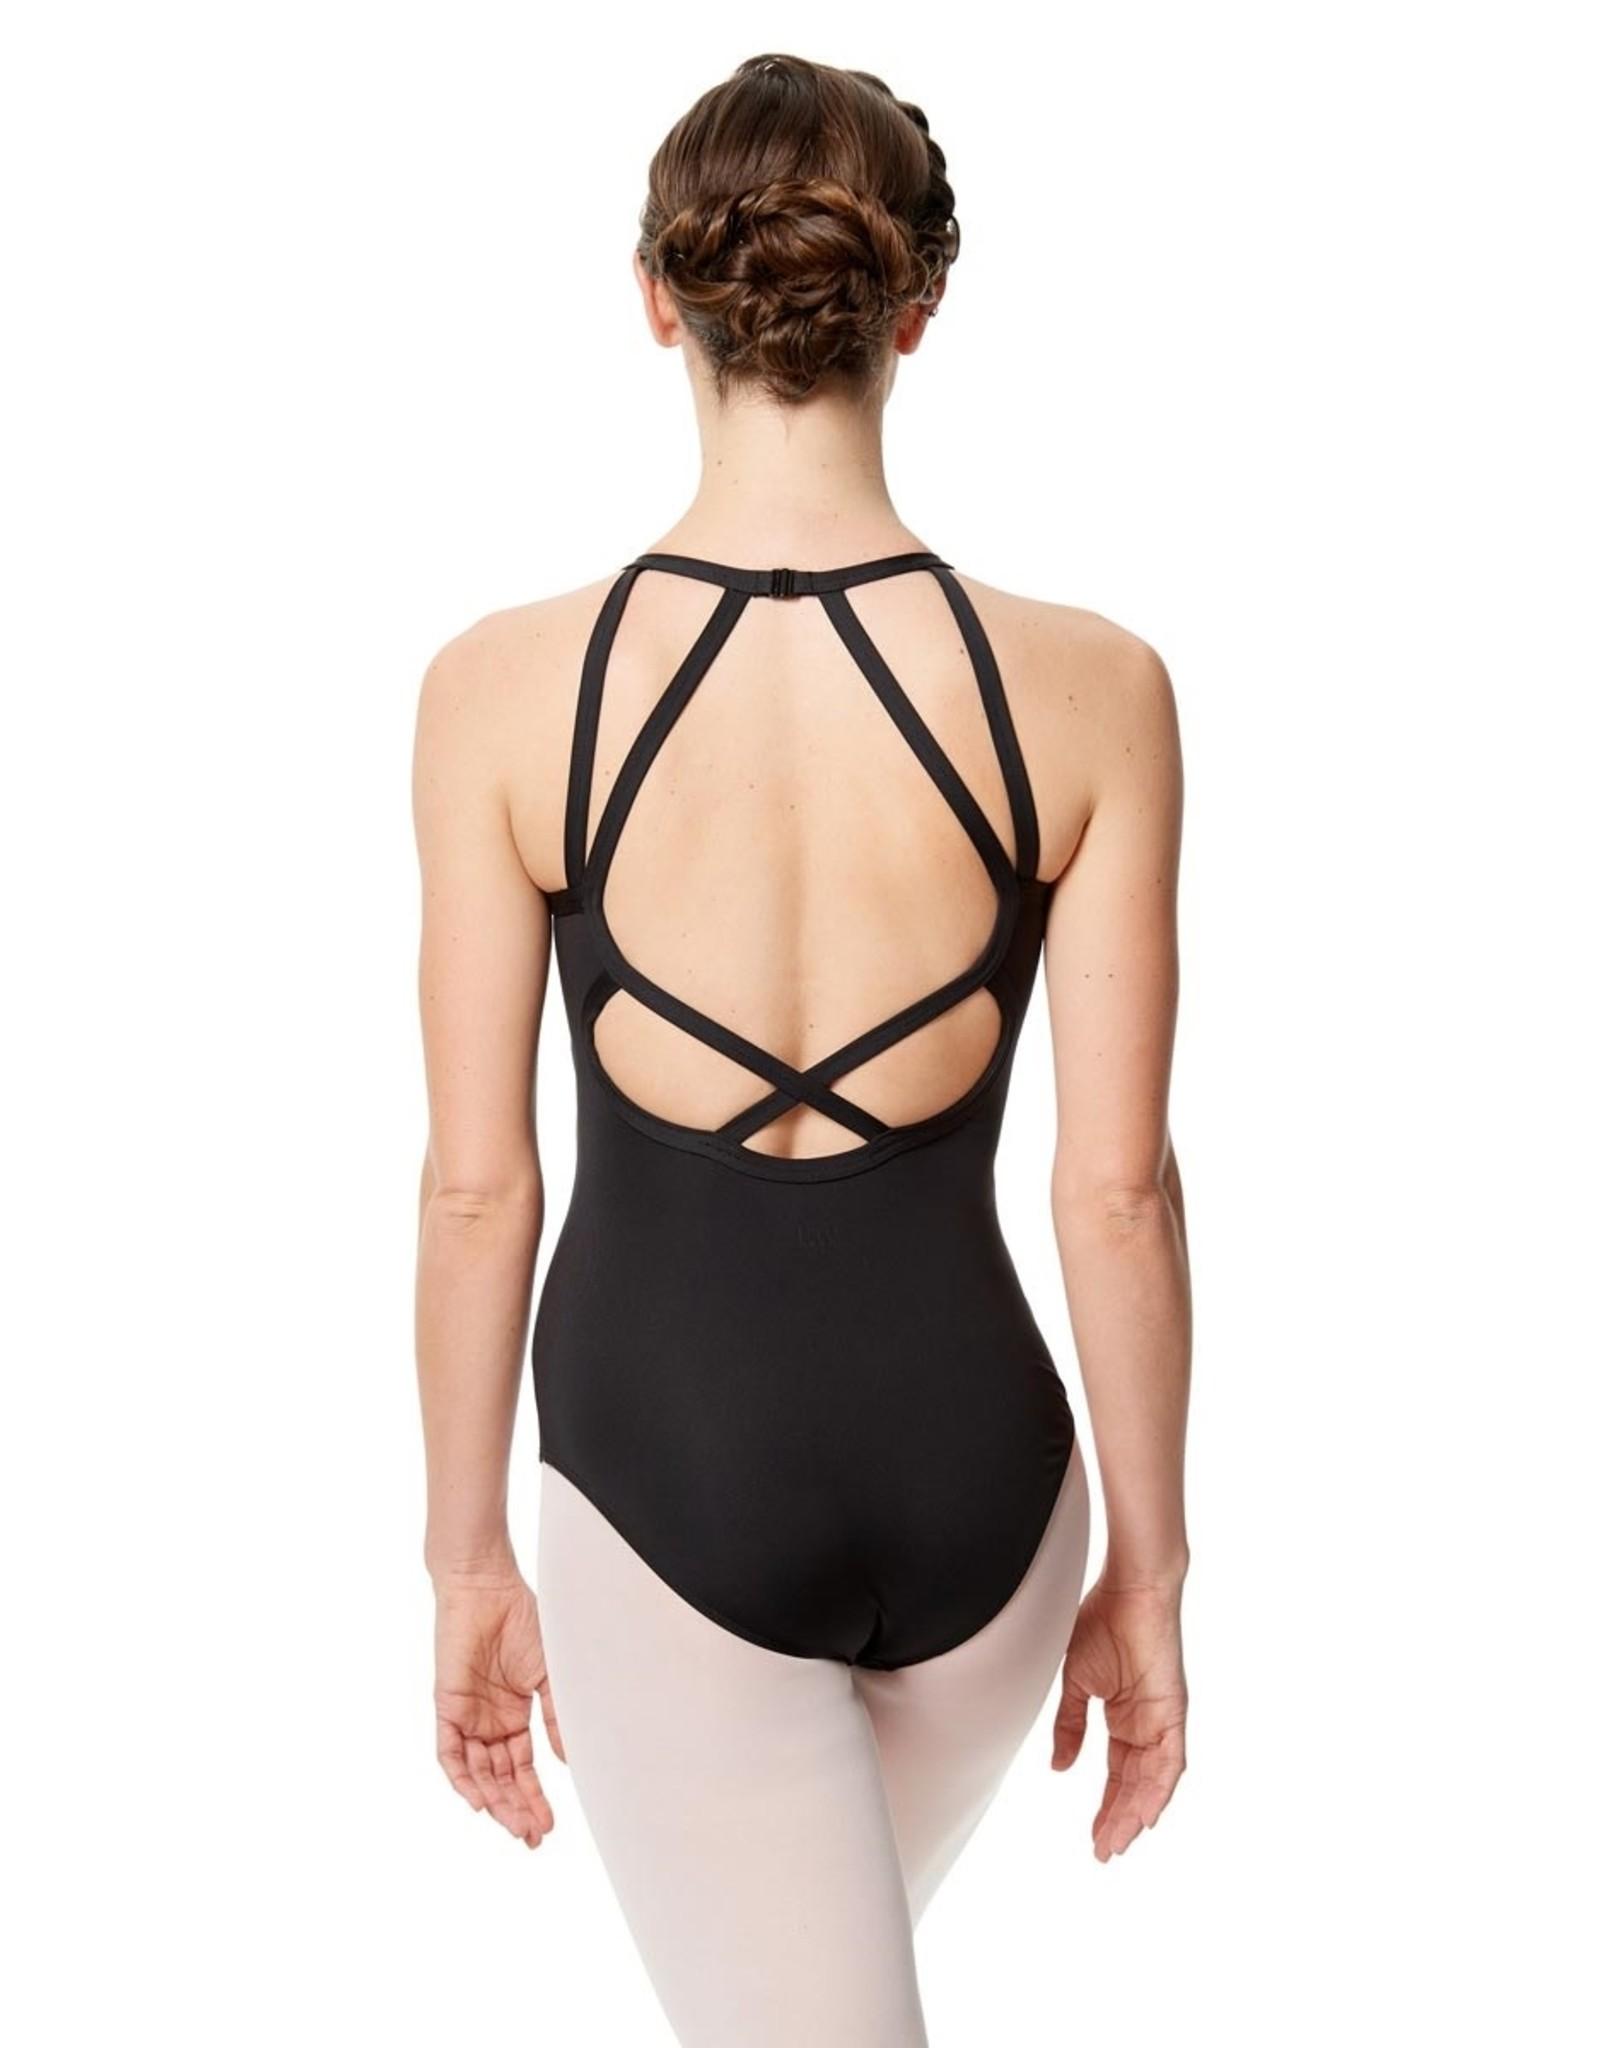 Lulli Dancewear Taliana Halter Neck Leotard with Strappy Back